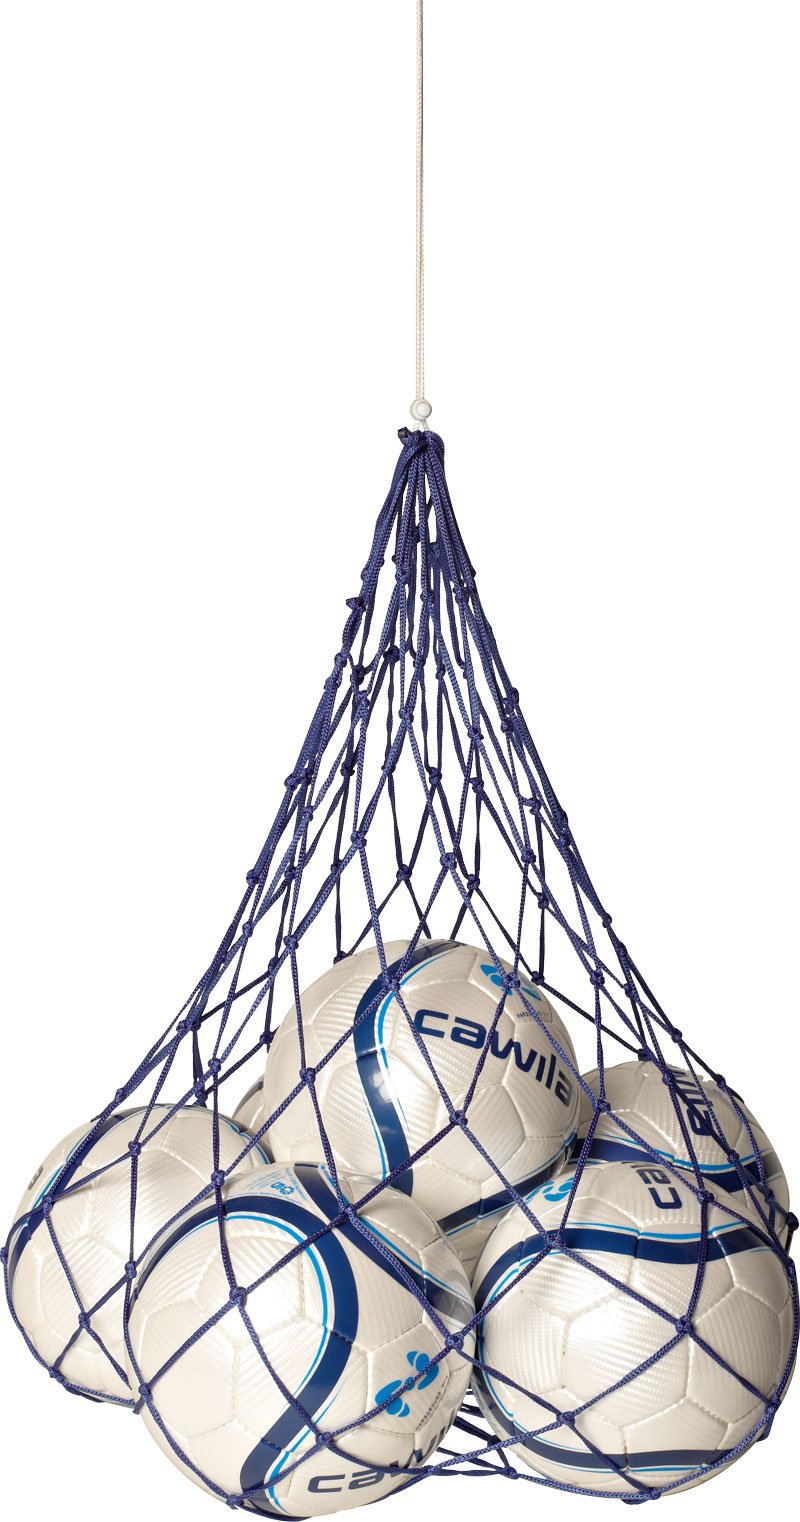 Image of   Cawila Nylon Ball Carry Net - 1 Ball